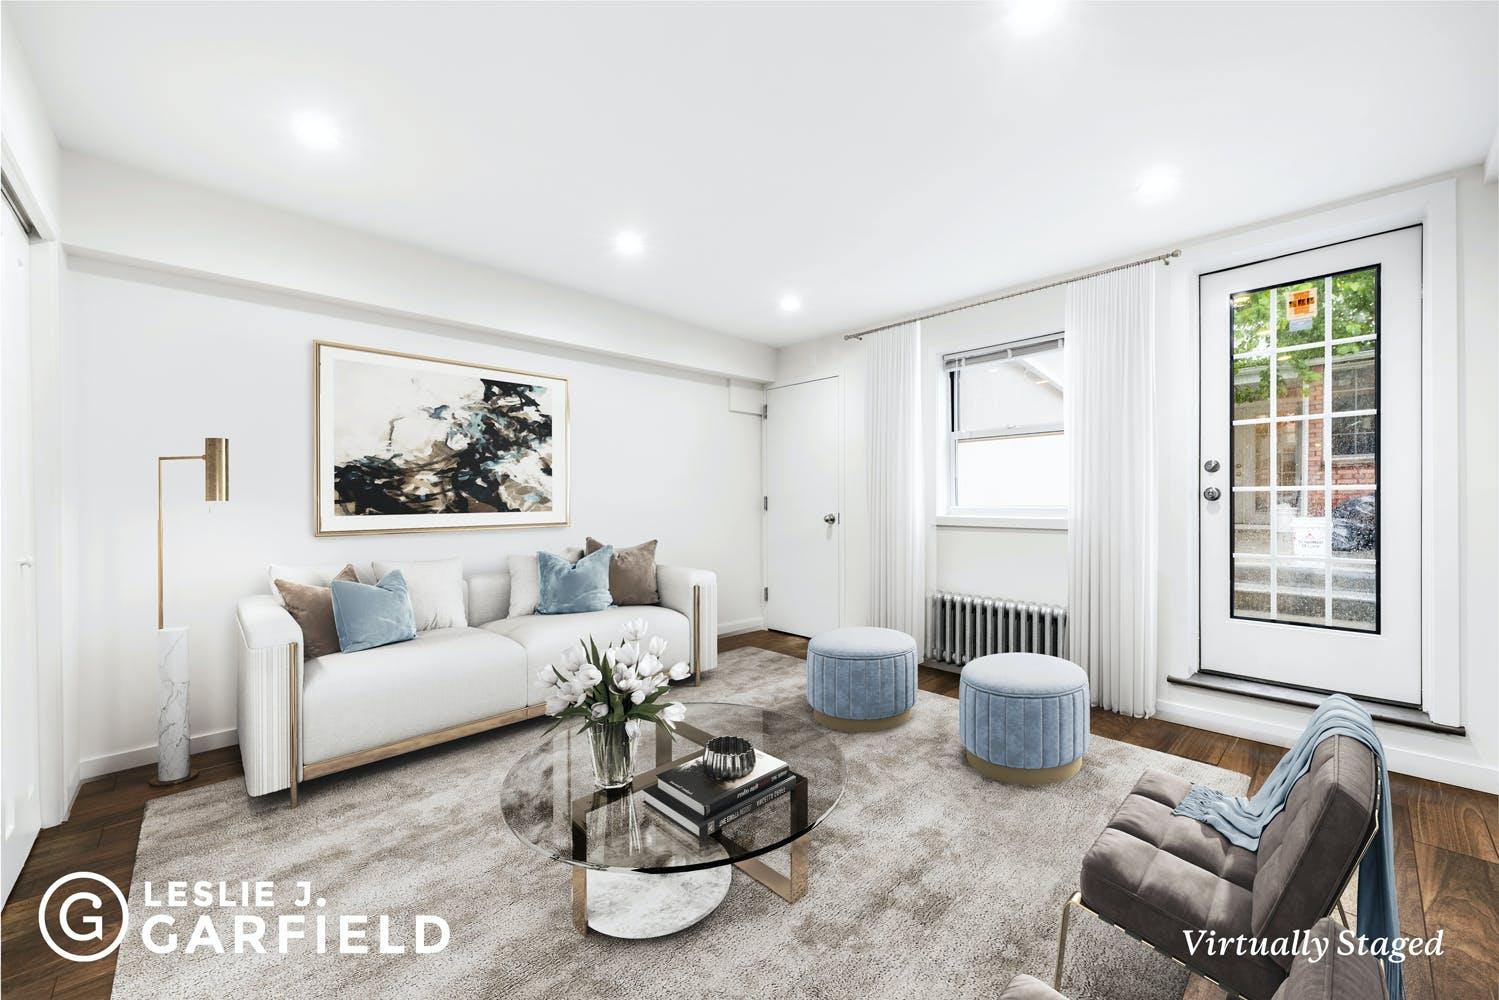 469A 18th Street - b9717650-7b0f-44d1-97c2-95e8df07873c - New York City Townhouse Real Estate